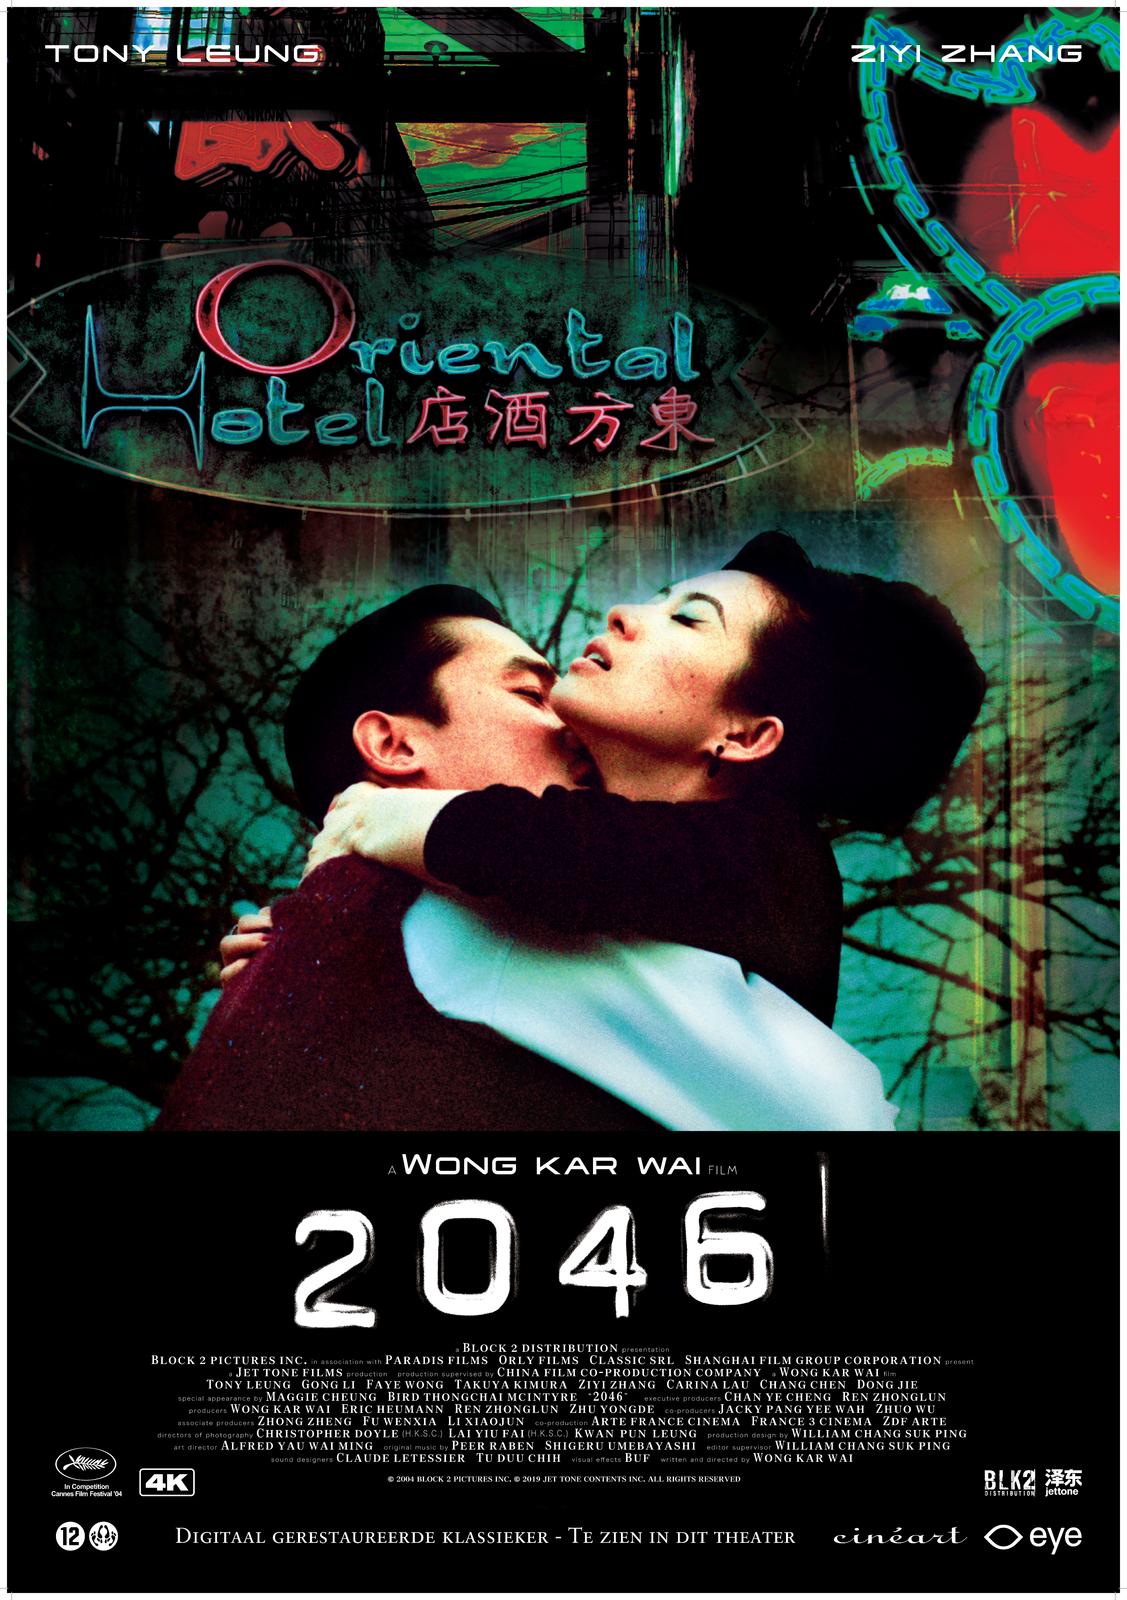 2046 (with Dutch subtitles)